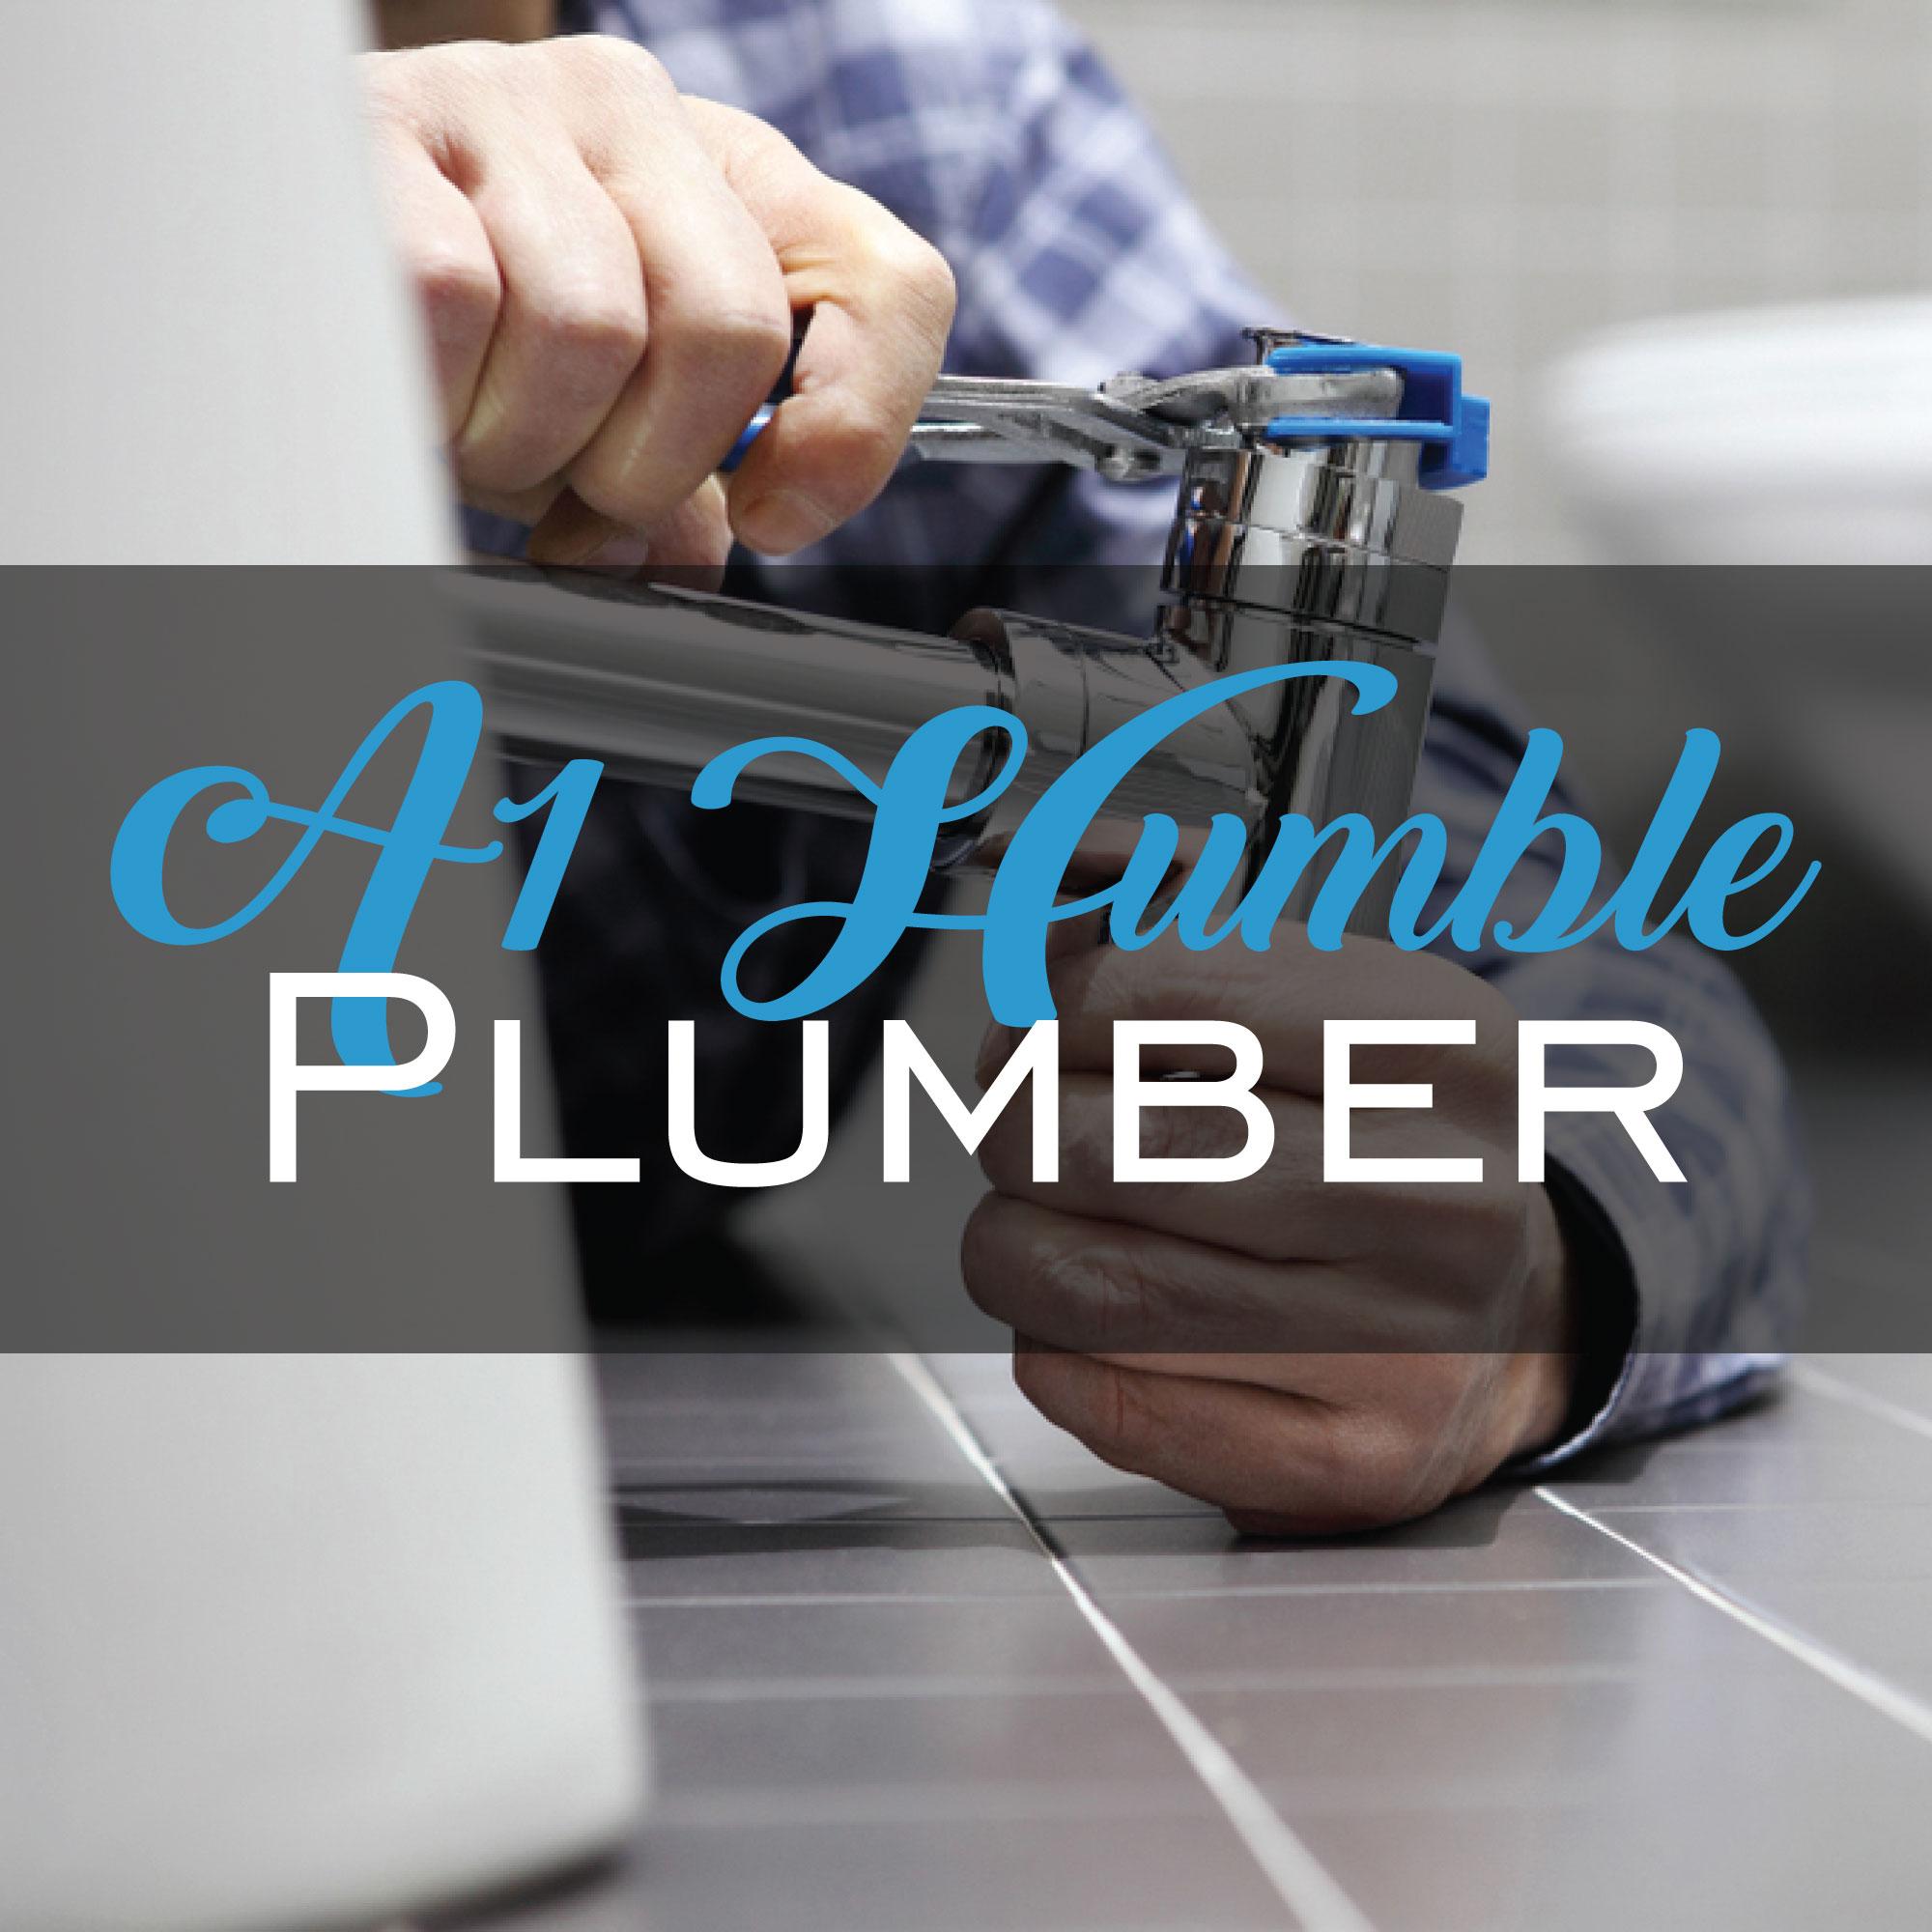 A1-Humble-Plumber-Logo.jpg